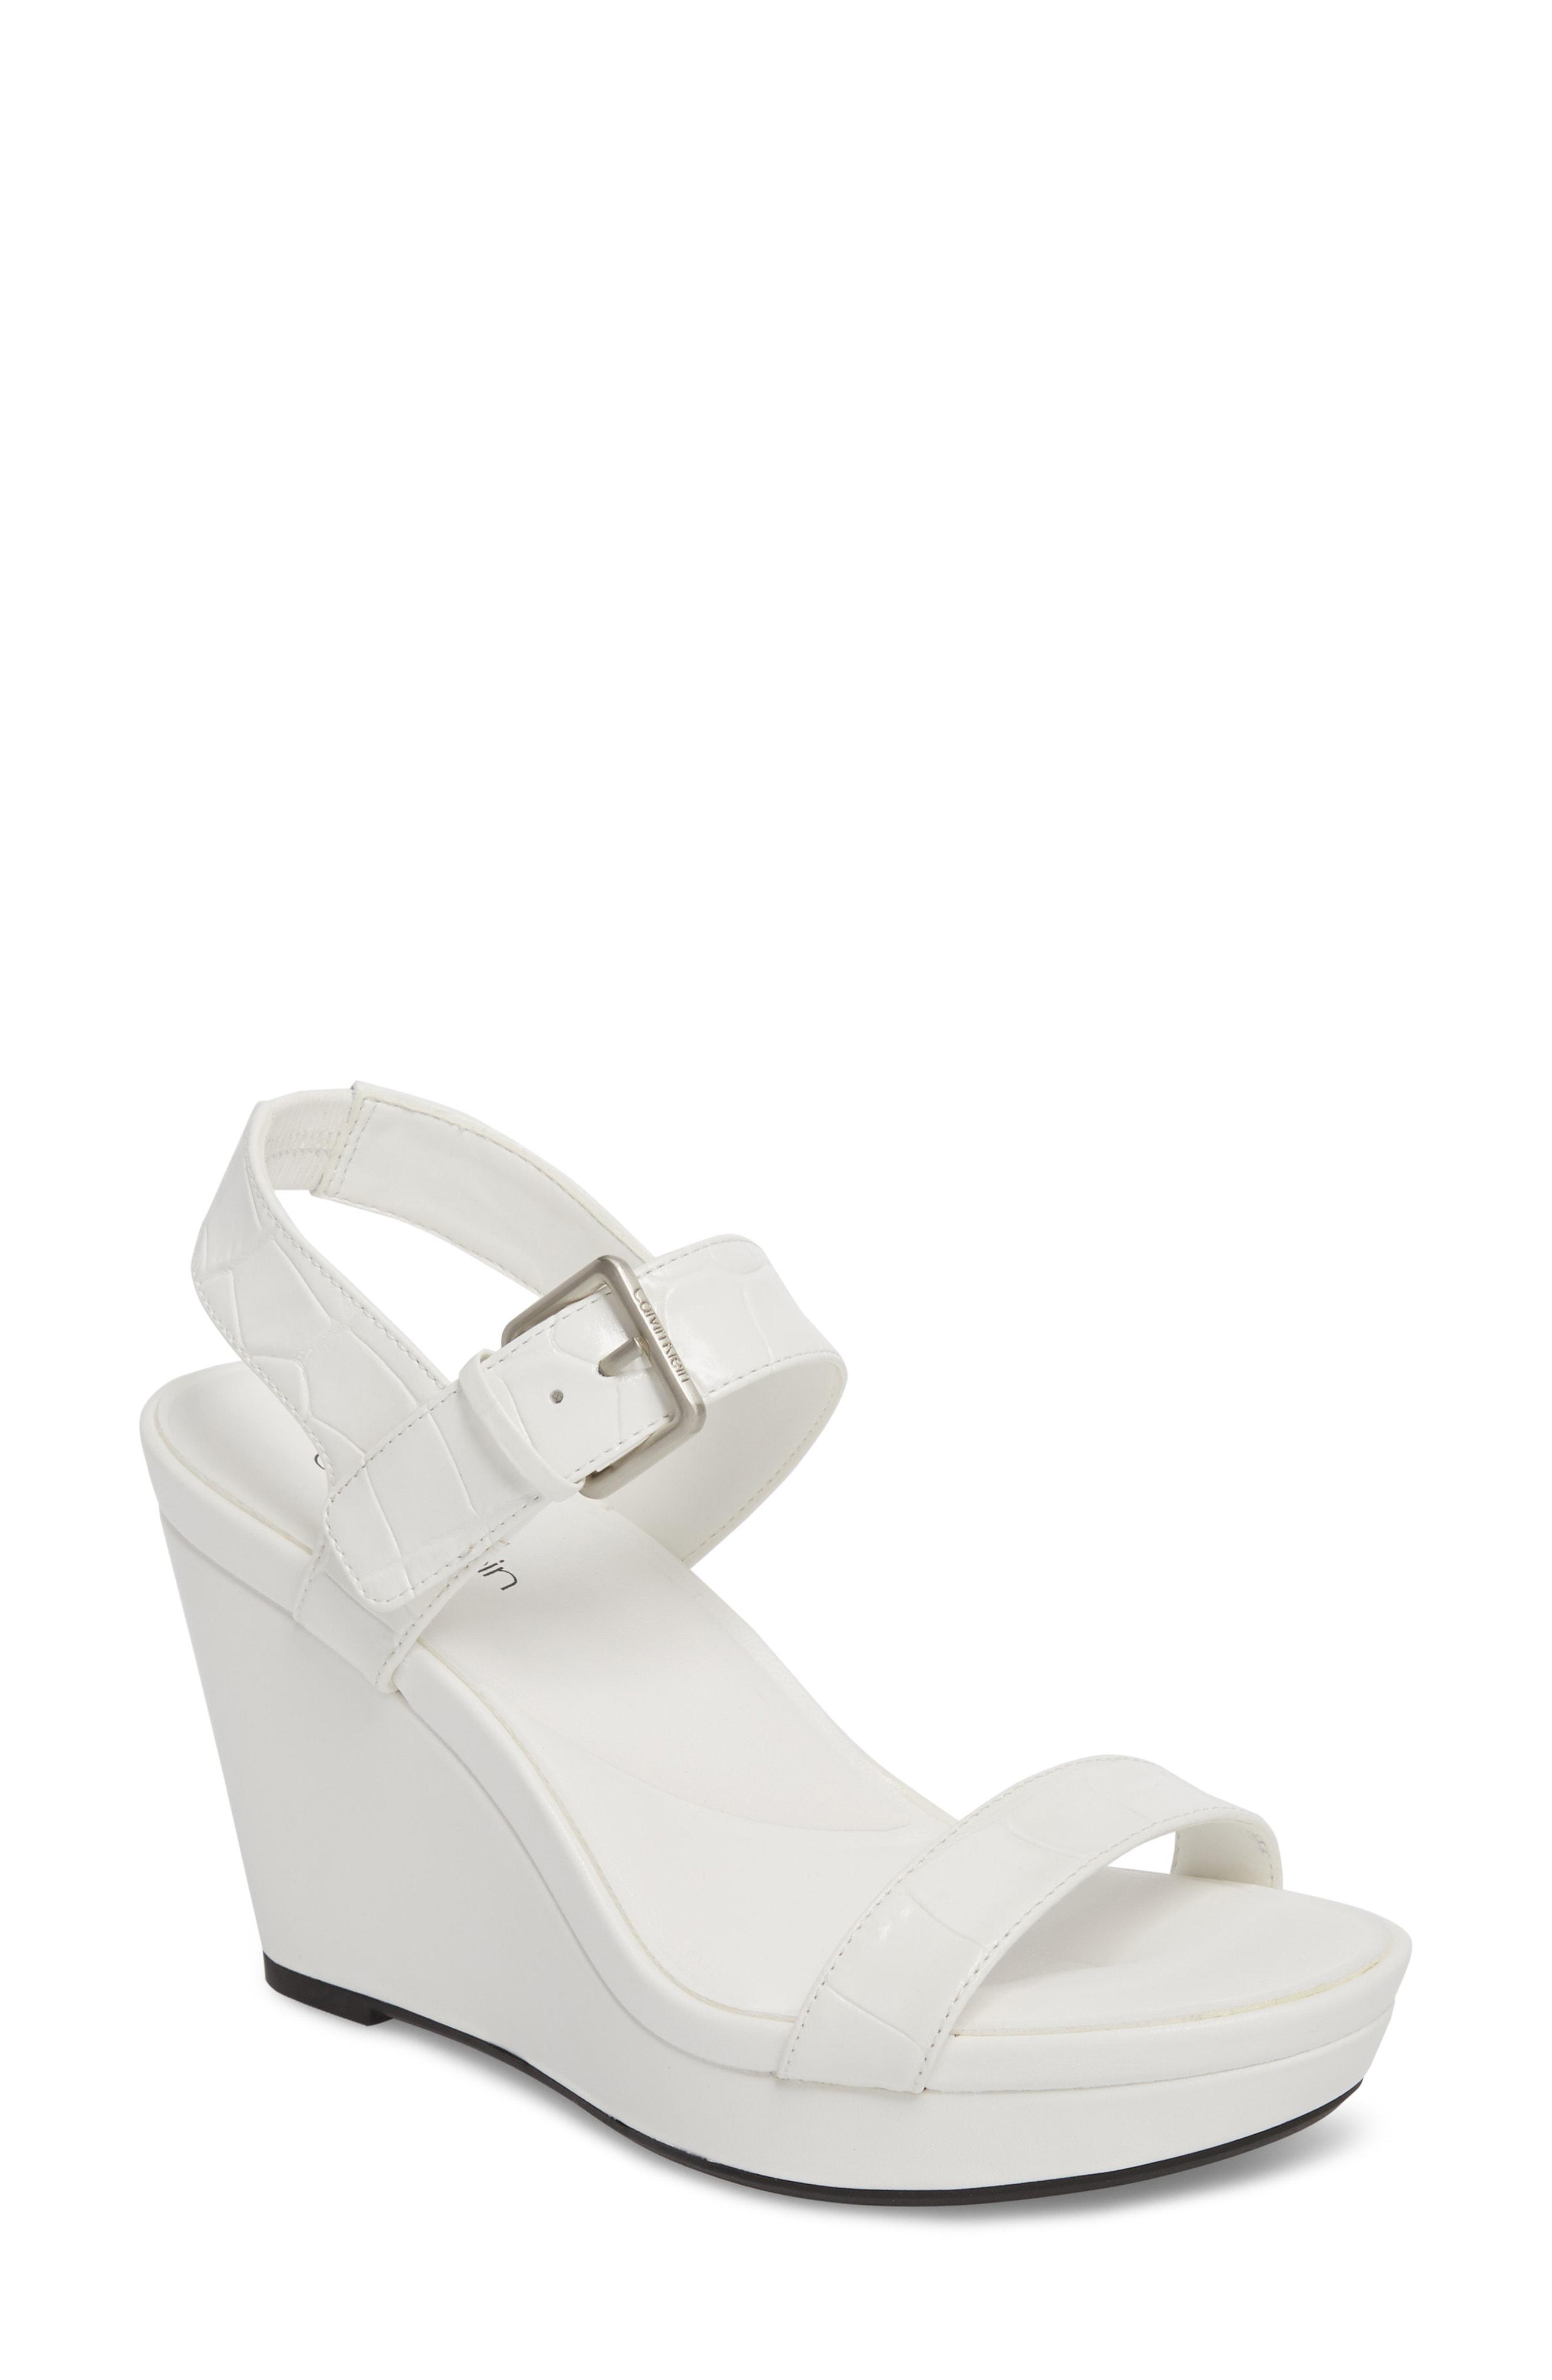 Calvin Klein Leather Jacie Sandal in